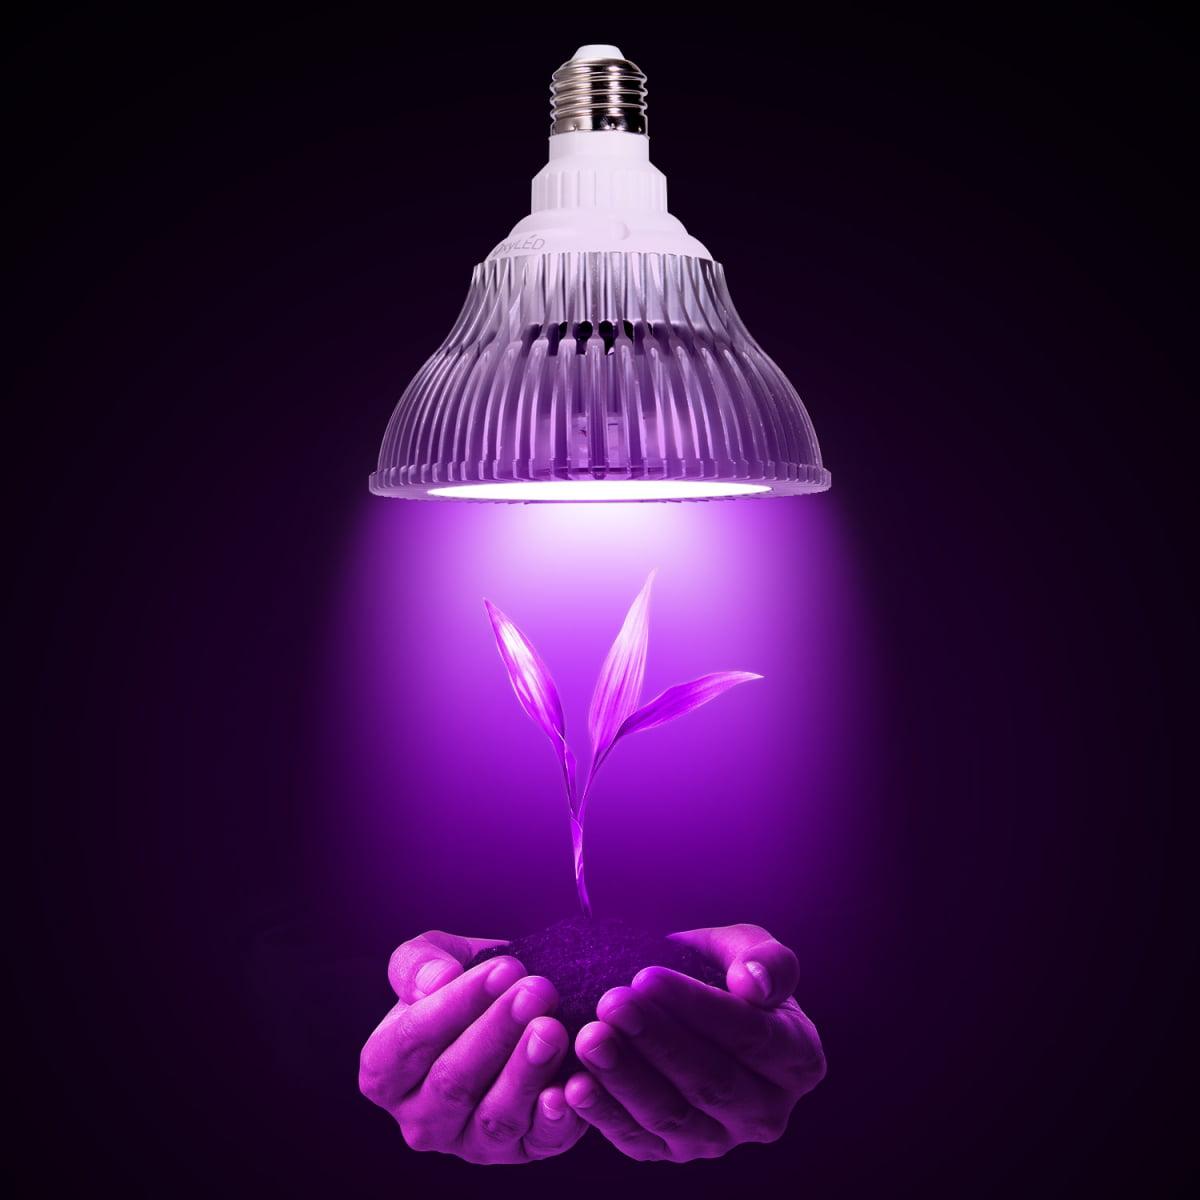 Oxyled Led Plant Grow Light Bulb Hydroponic Plant Grow